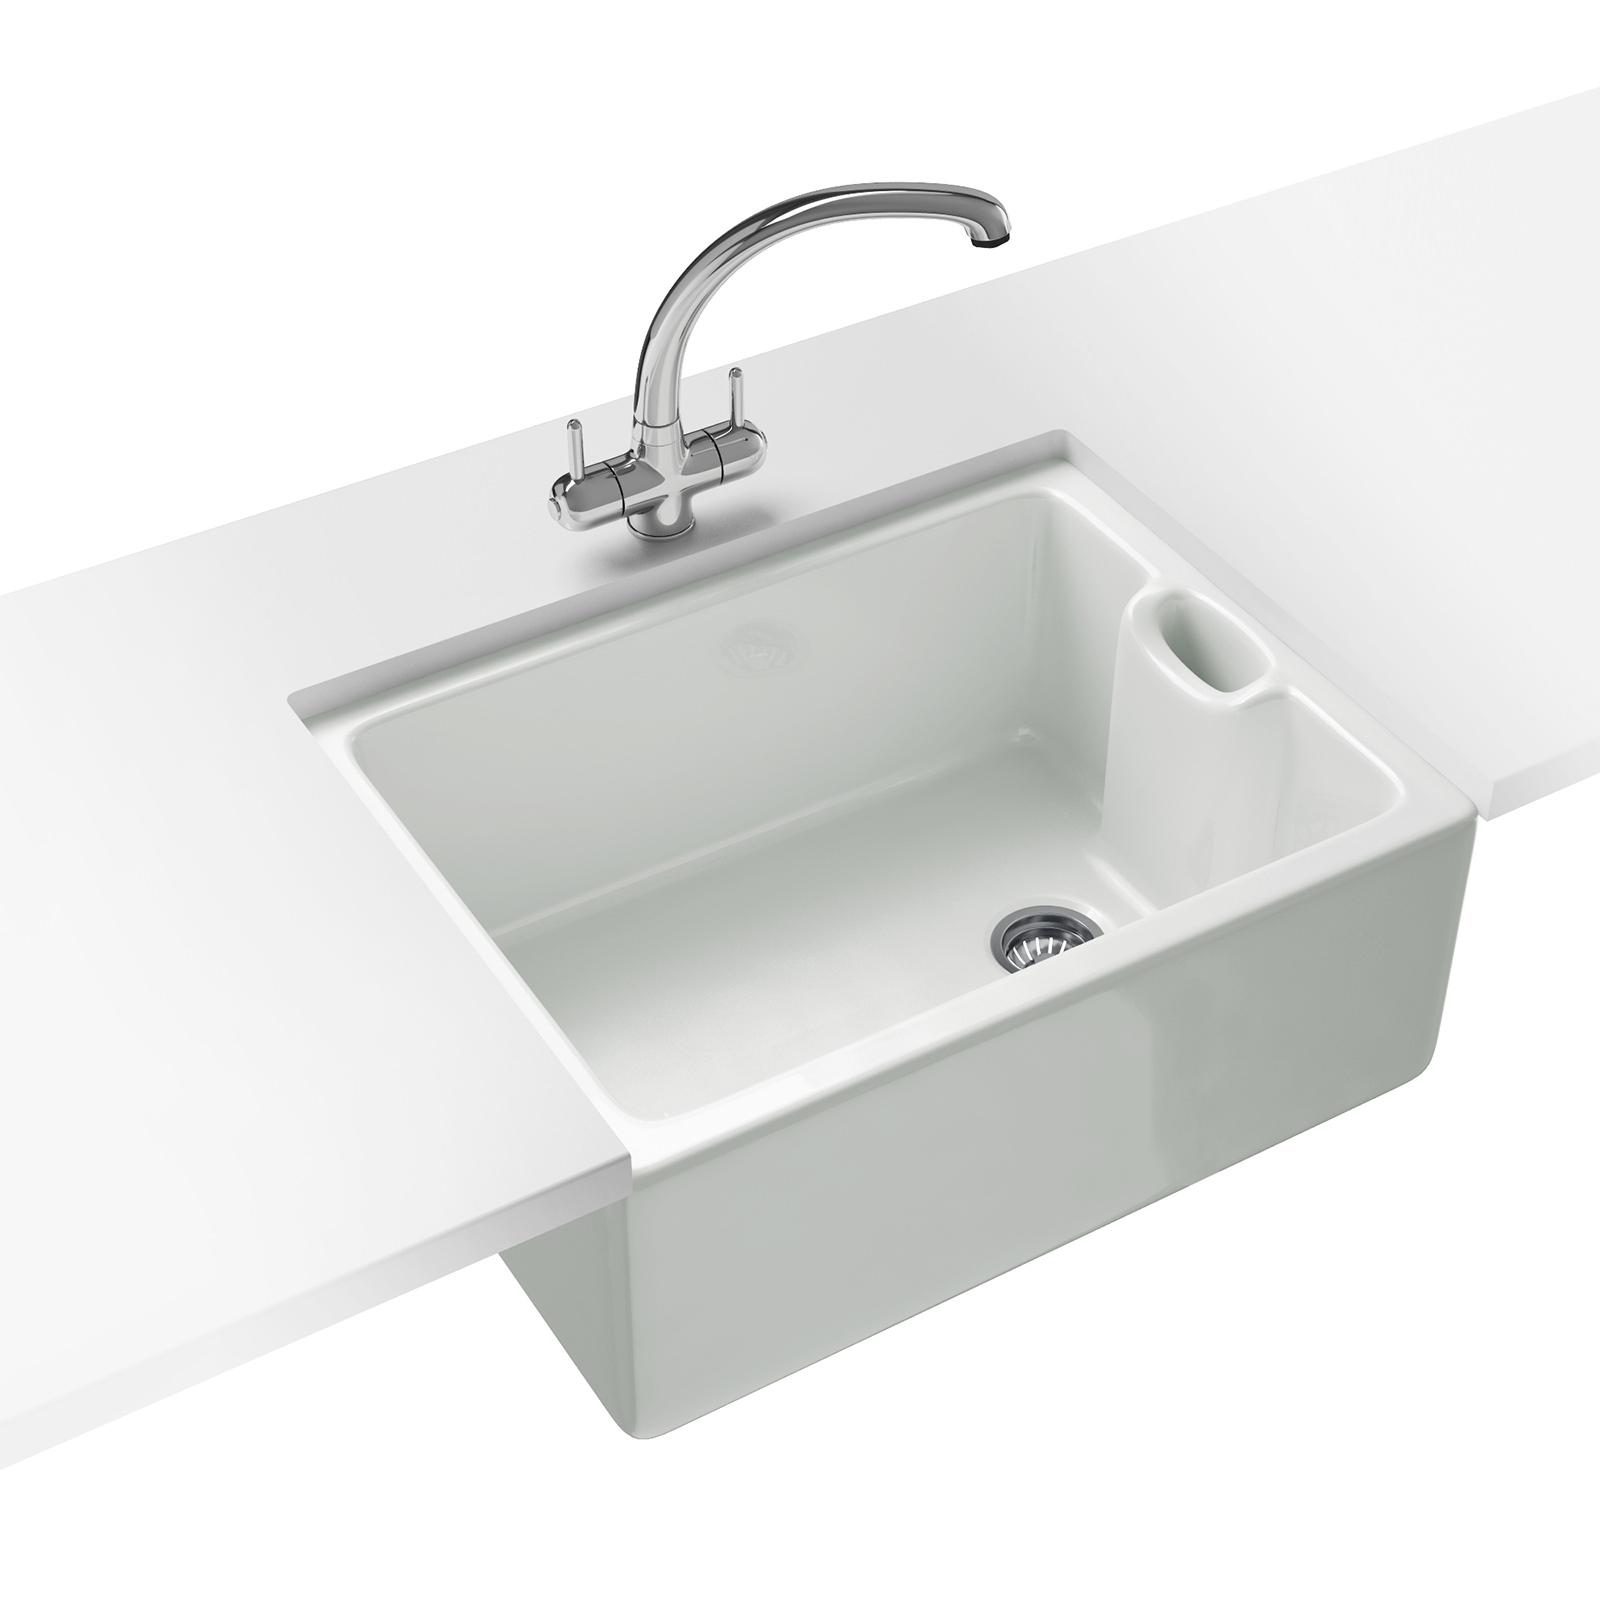 Franke Belfast BAK 710 Ceramic 1.0 Bowl White Kitchen Sink